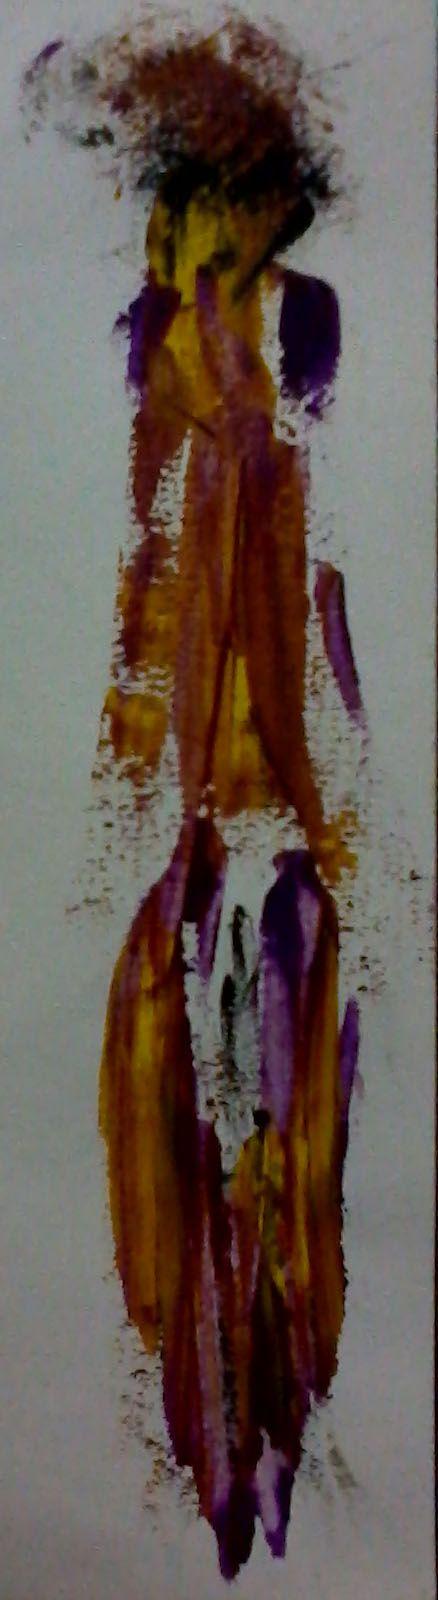 my painting 5